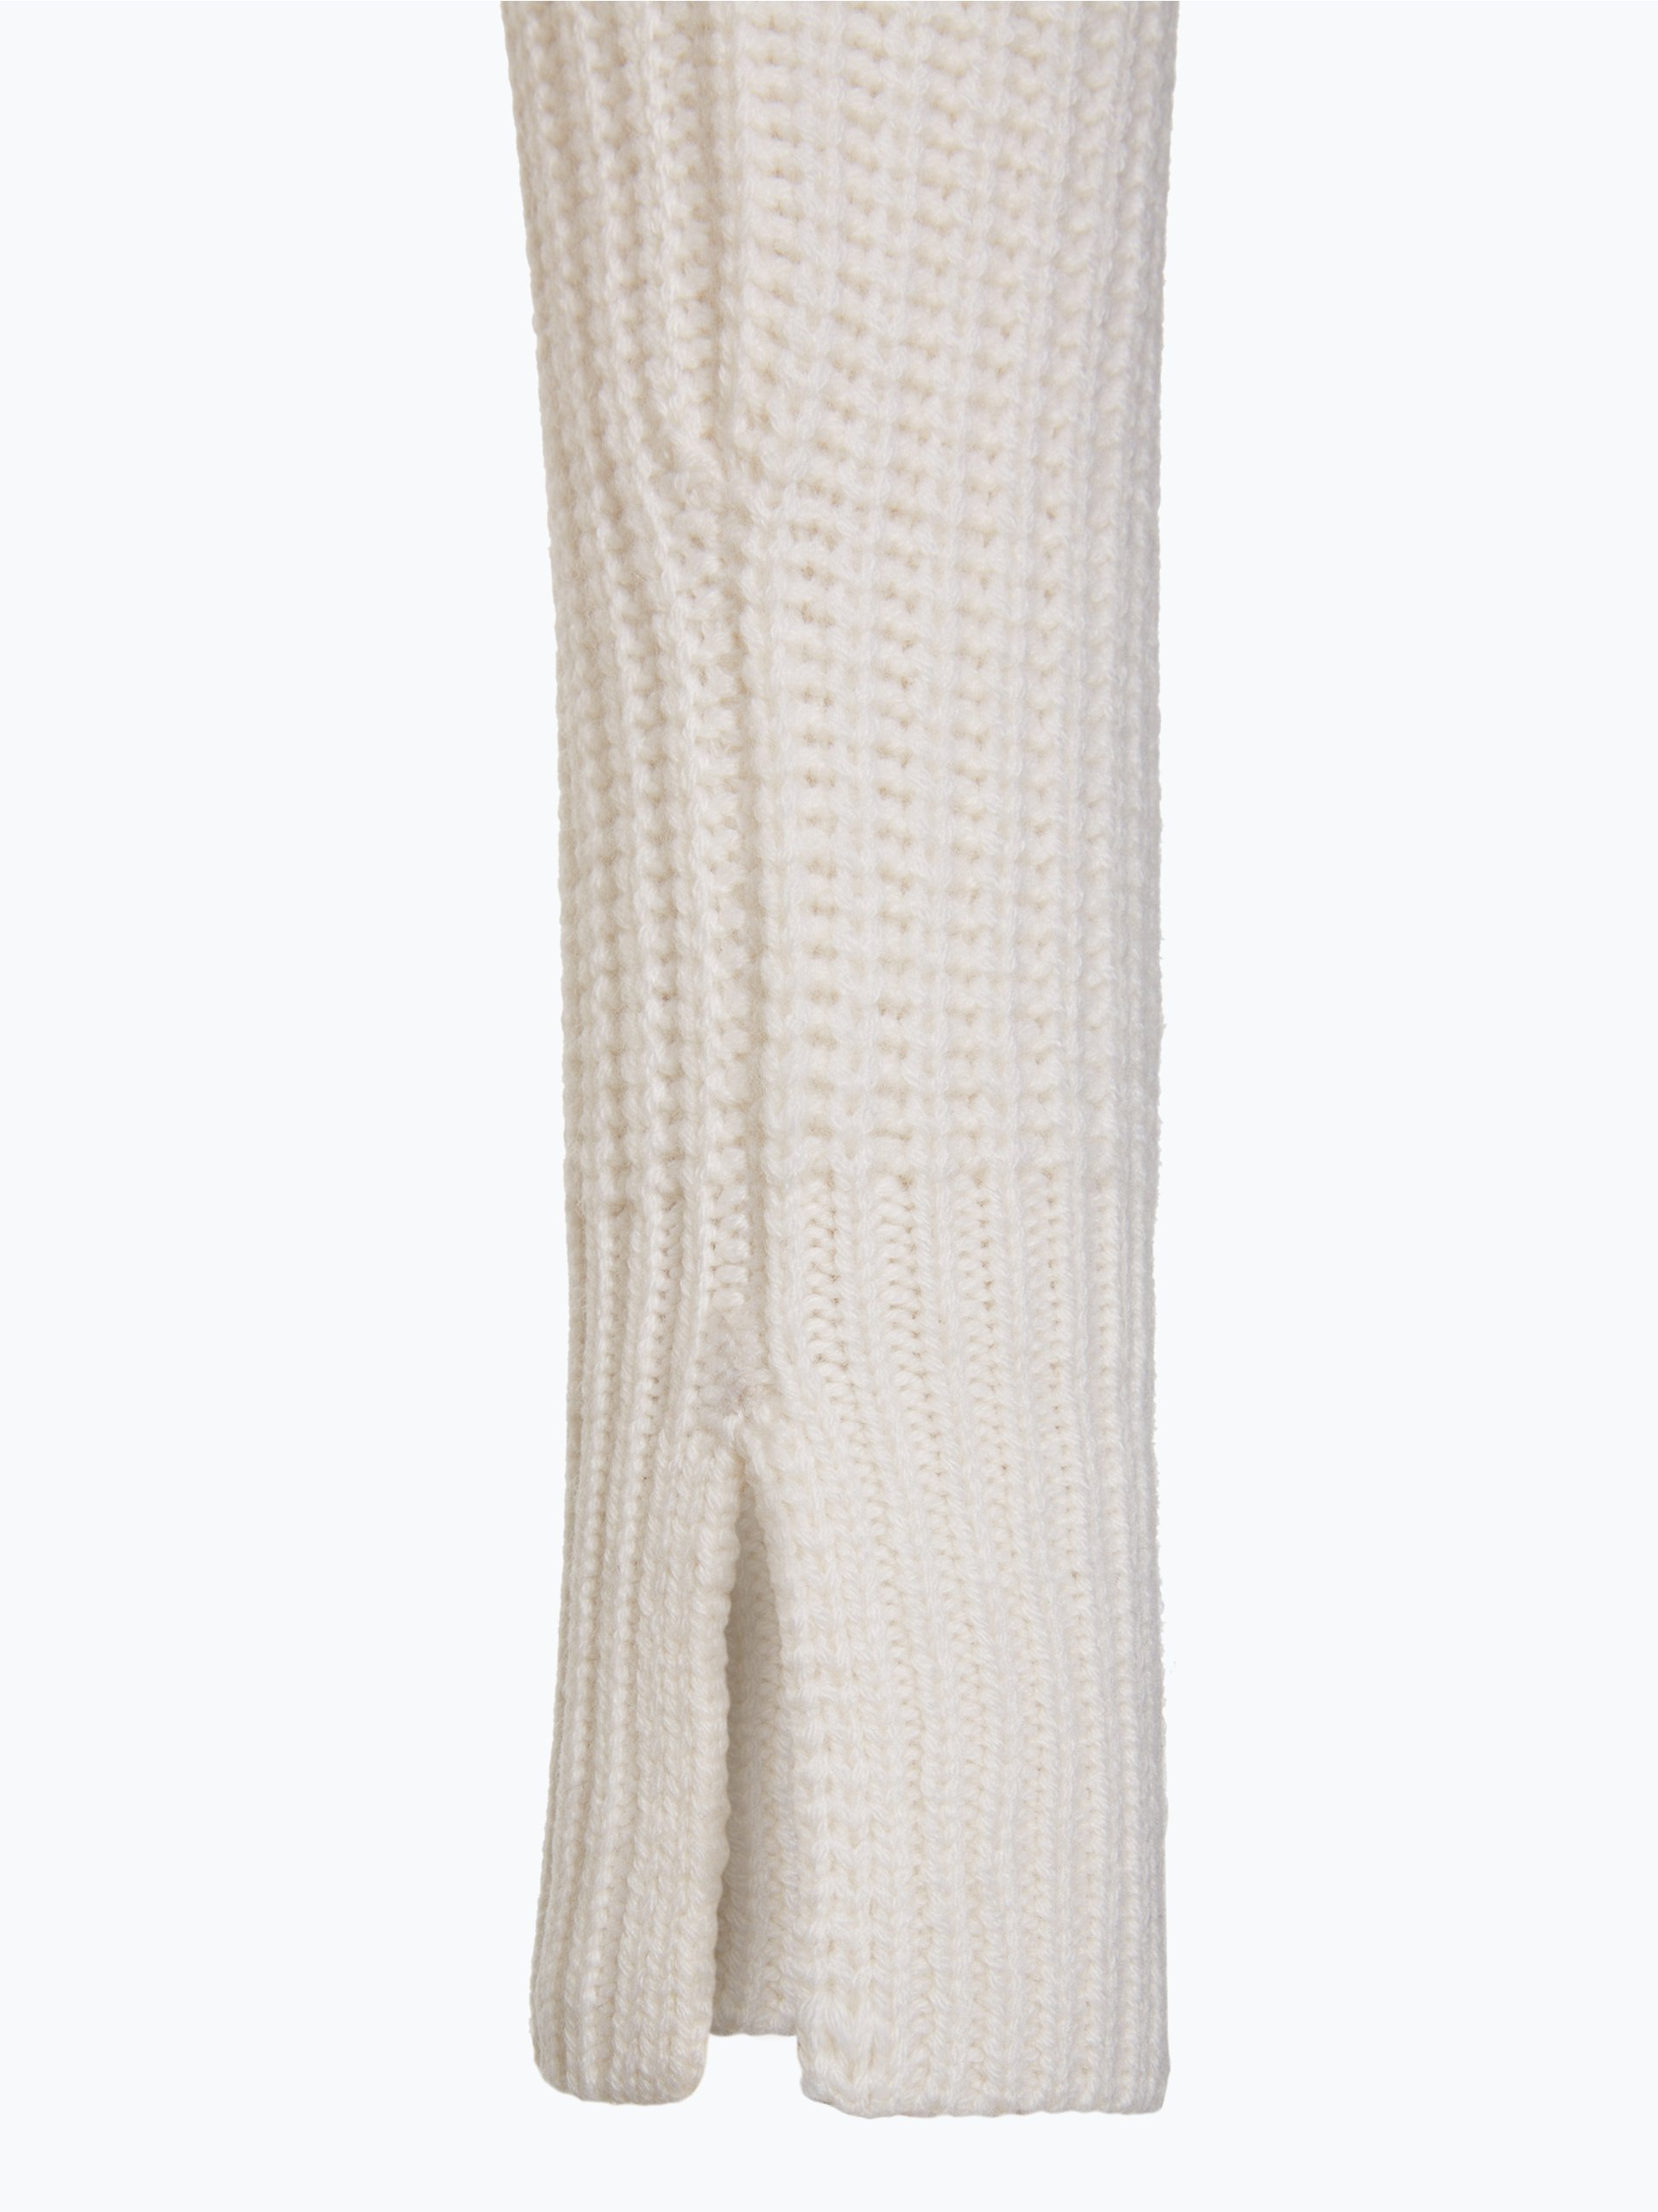 svb exquisit damen pullover mit cashmere anteil ecru uni. Black Bedroom Furniture Sets. Home Design Ideas